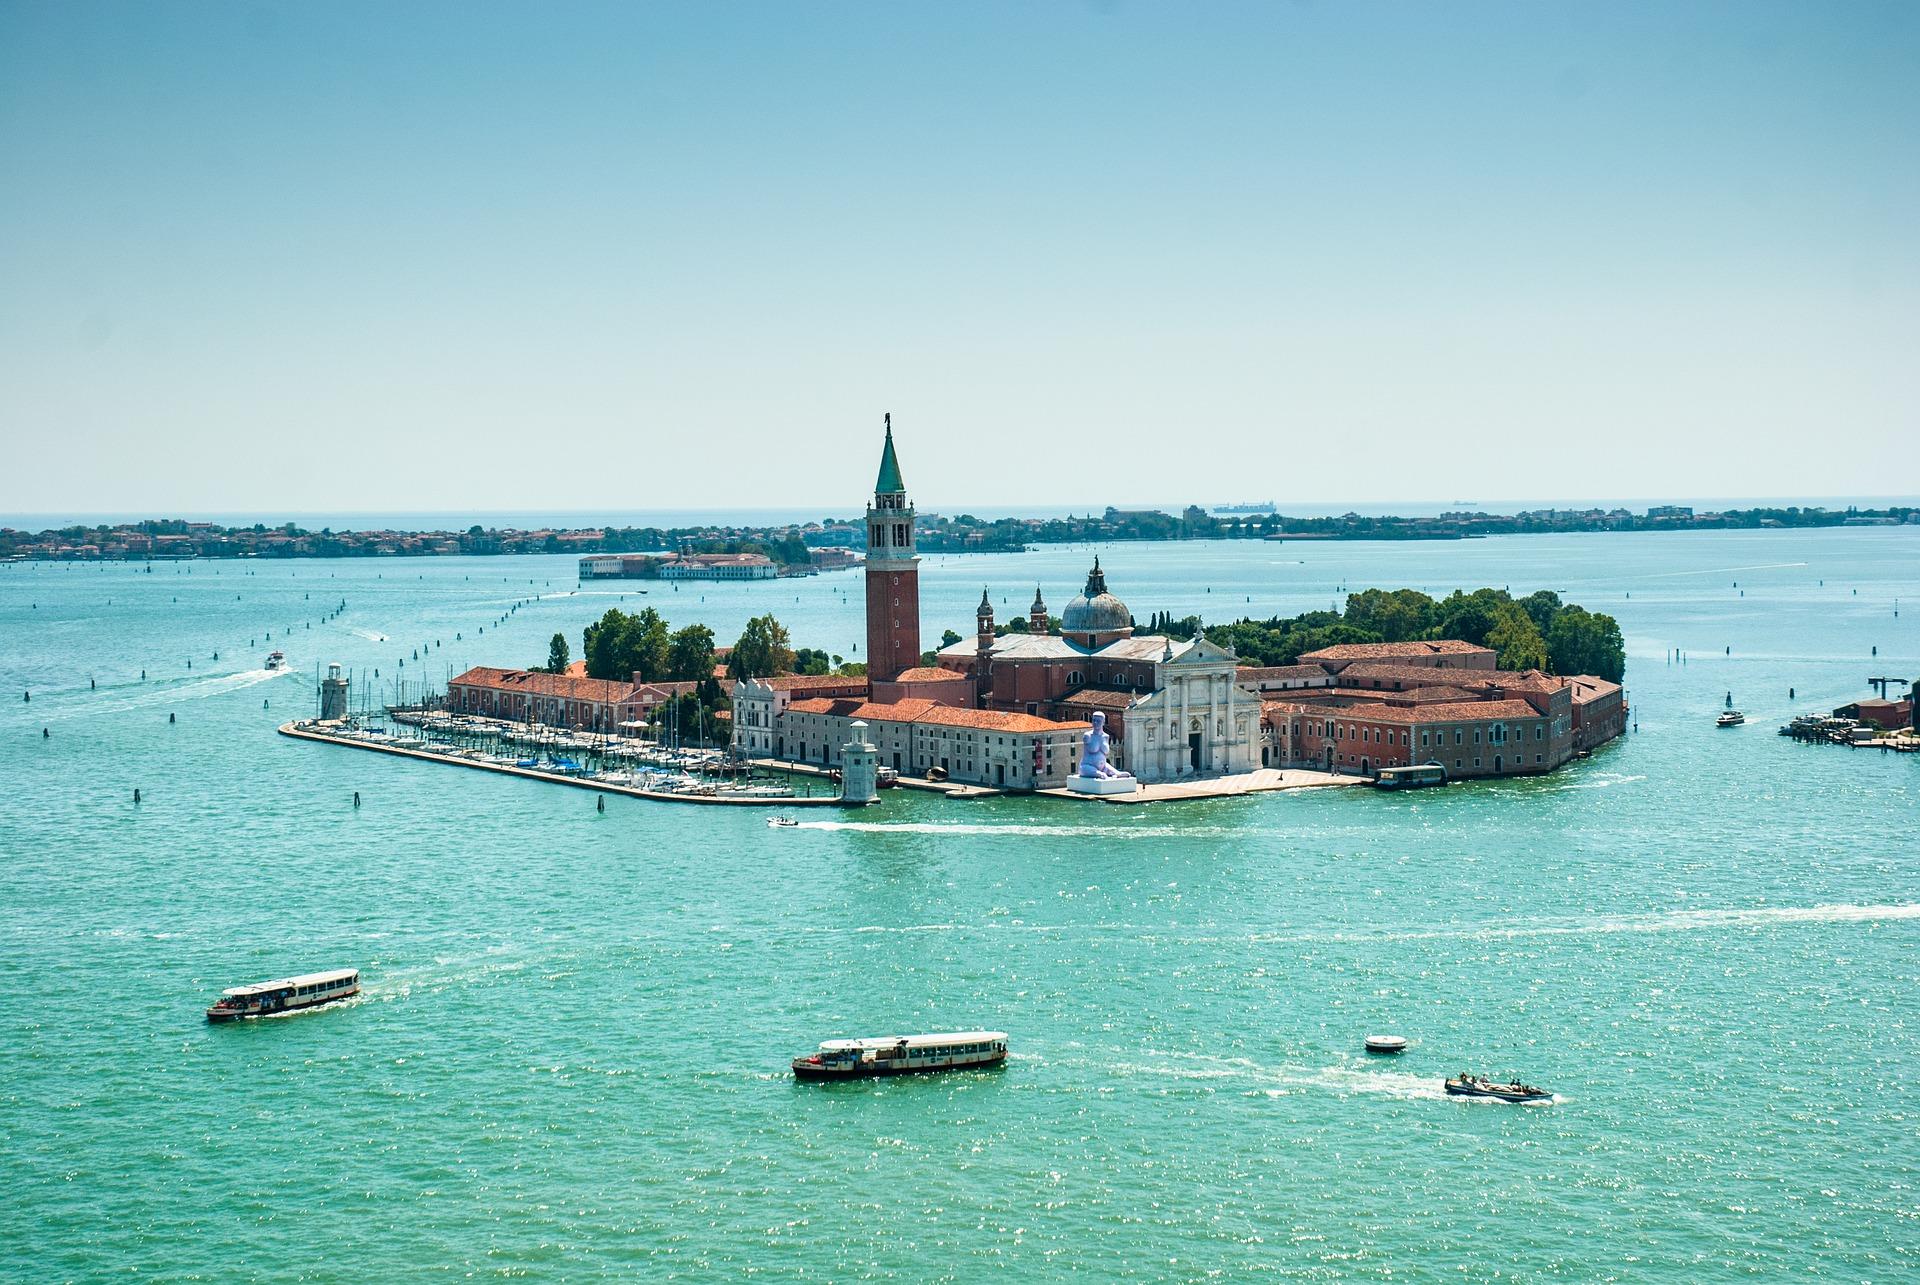 Venice - Image Credit